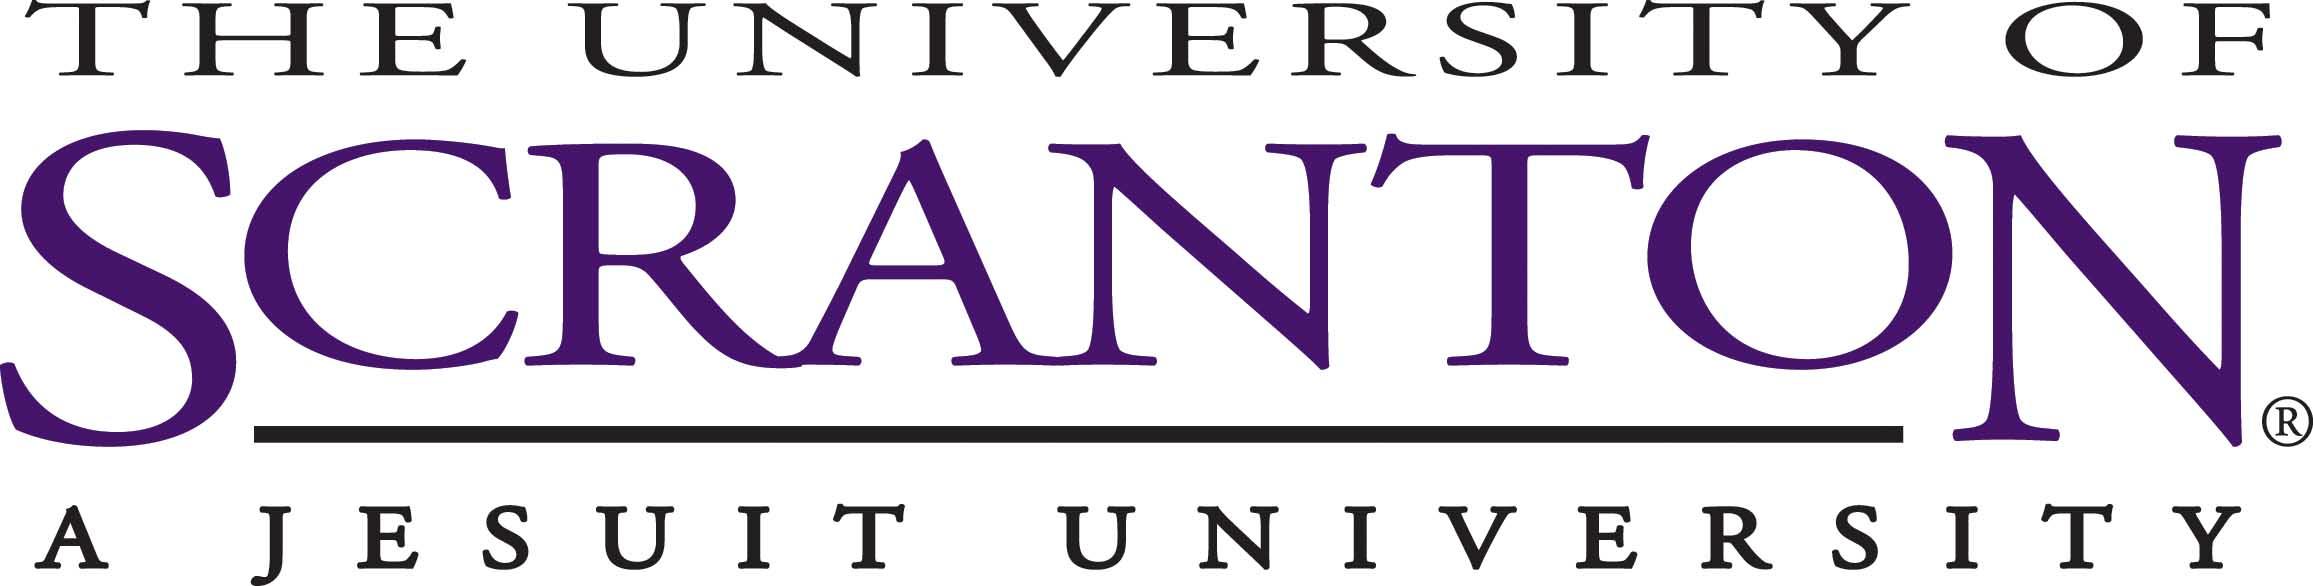 University-of-Scranton-Logo.jpg